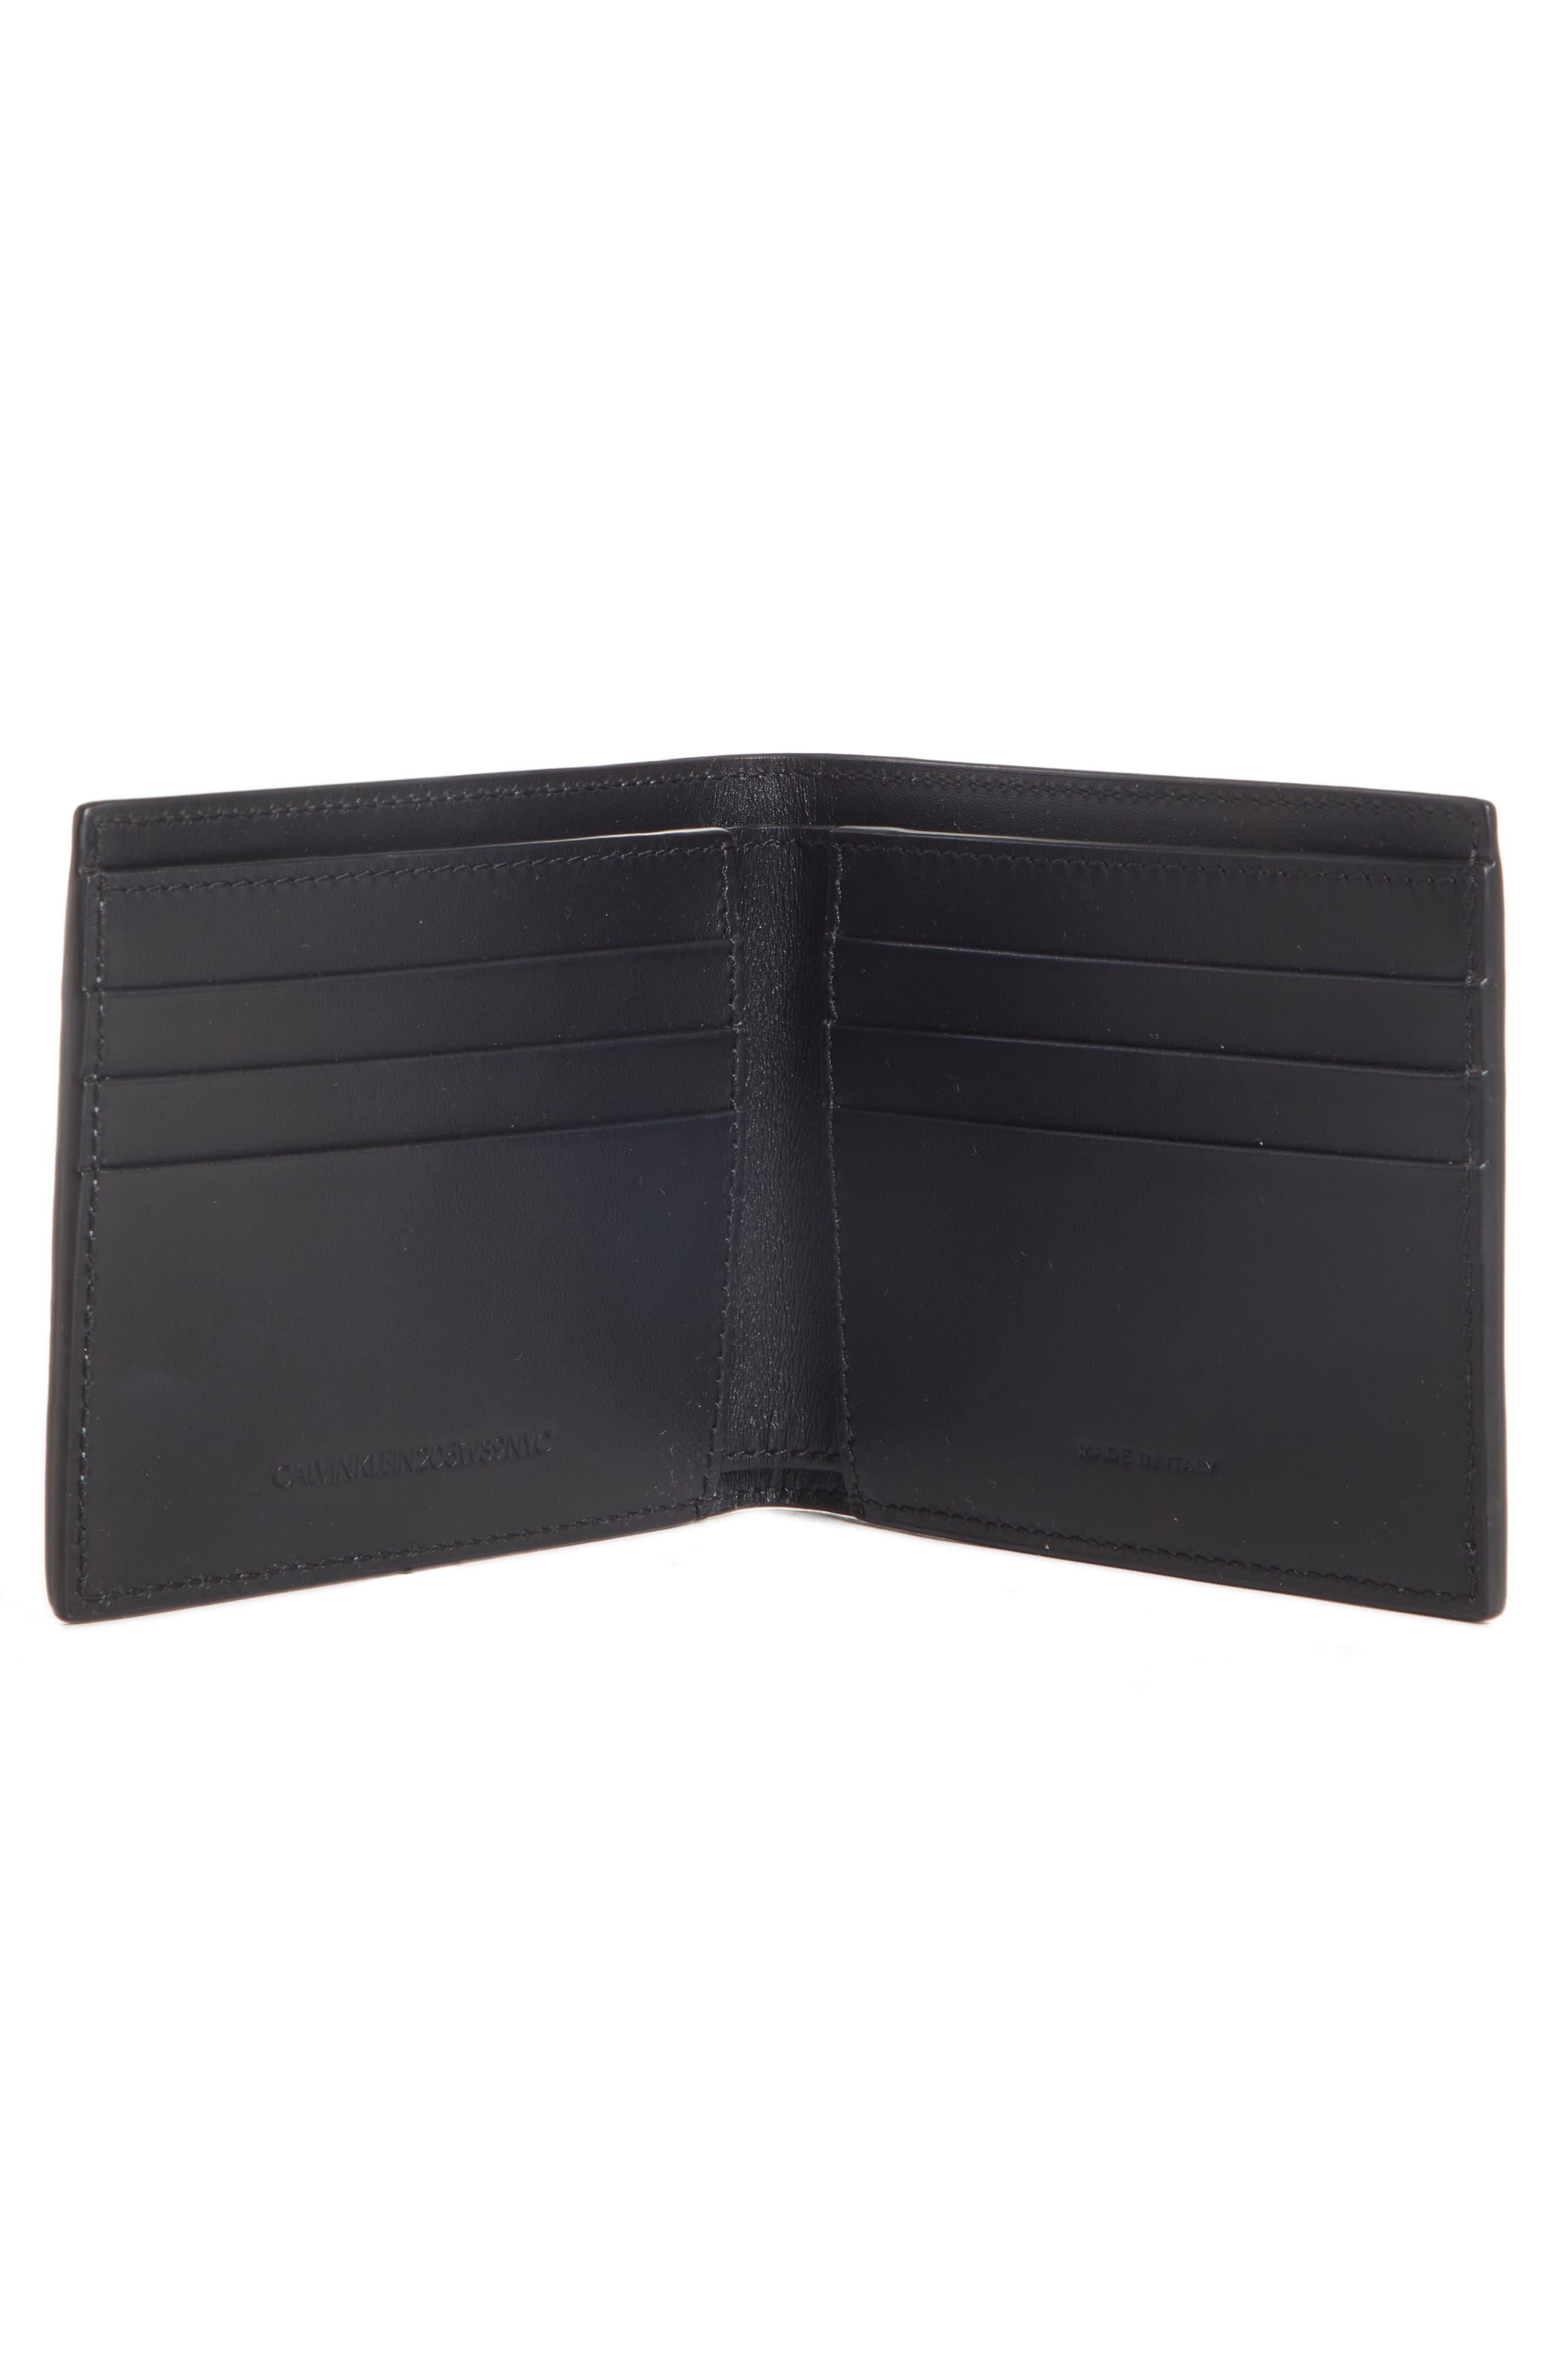 Leather Wallet,                             Alternate thumbnail 2, color,                             BLACK